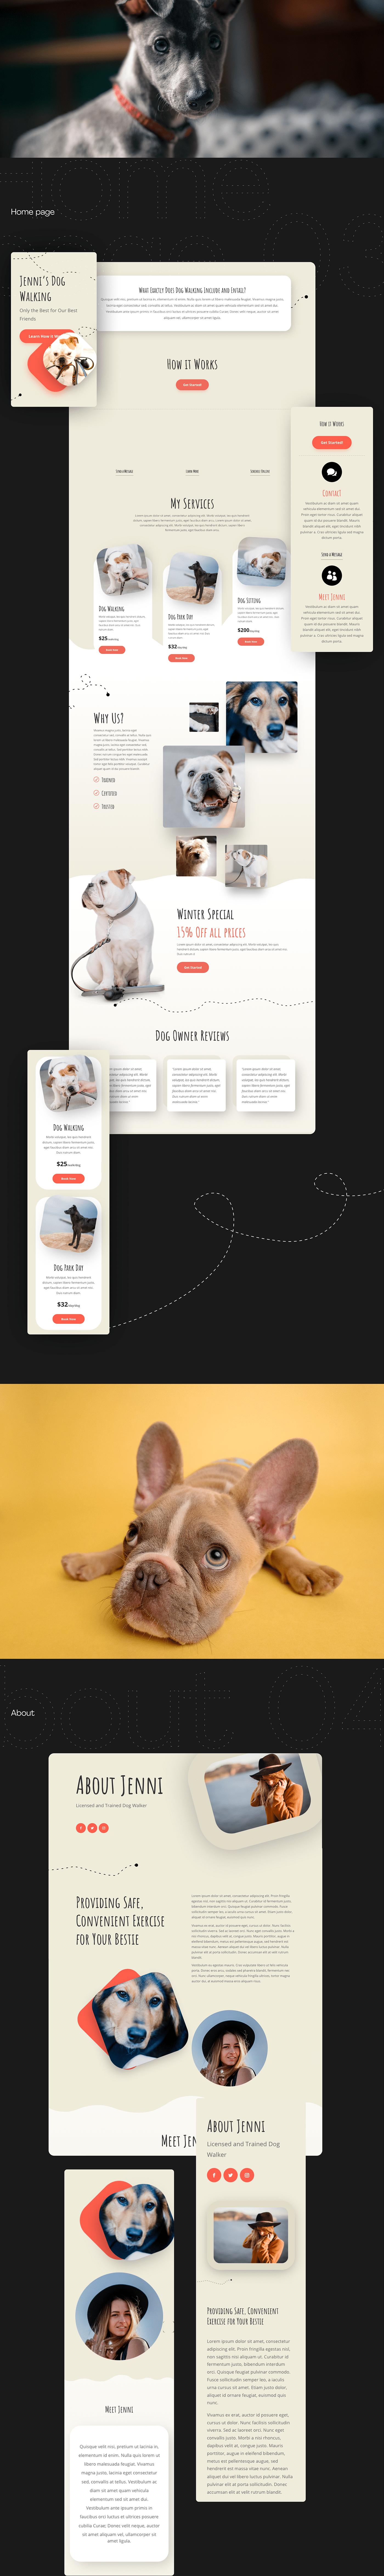 design Interaction design  UI/UX Web Design  web development  Website